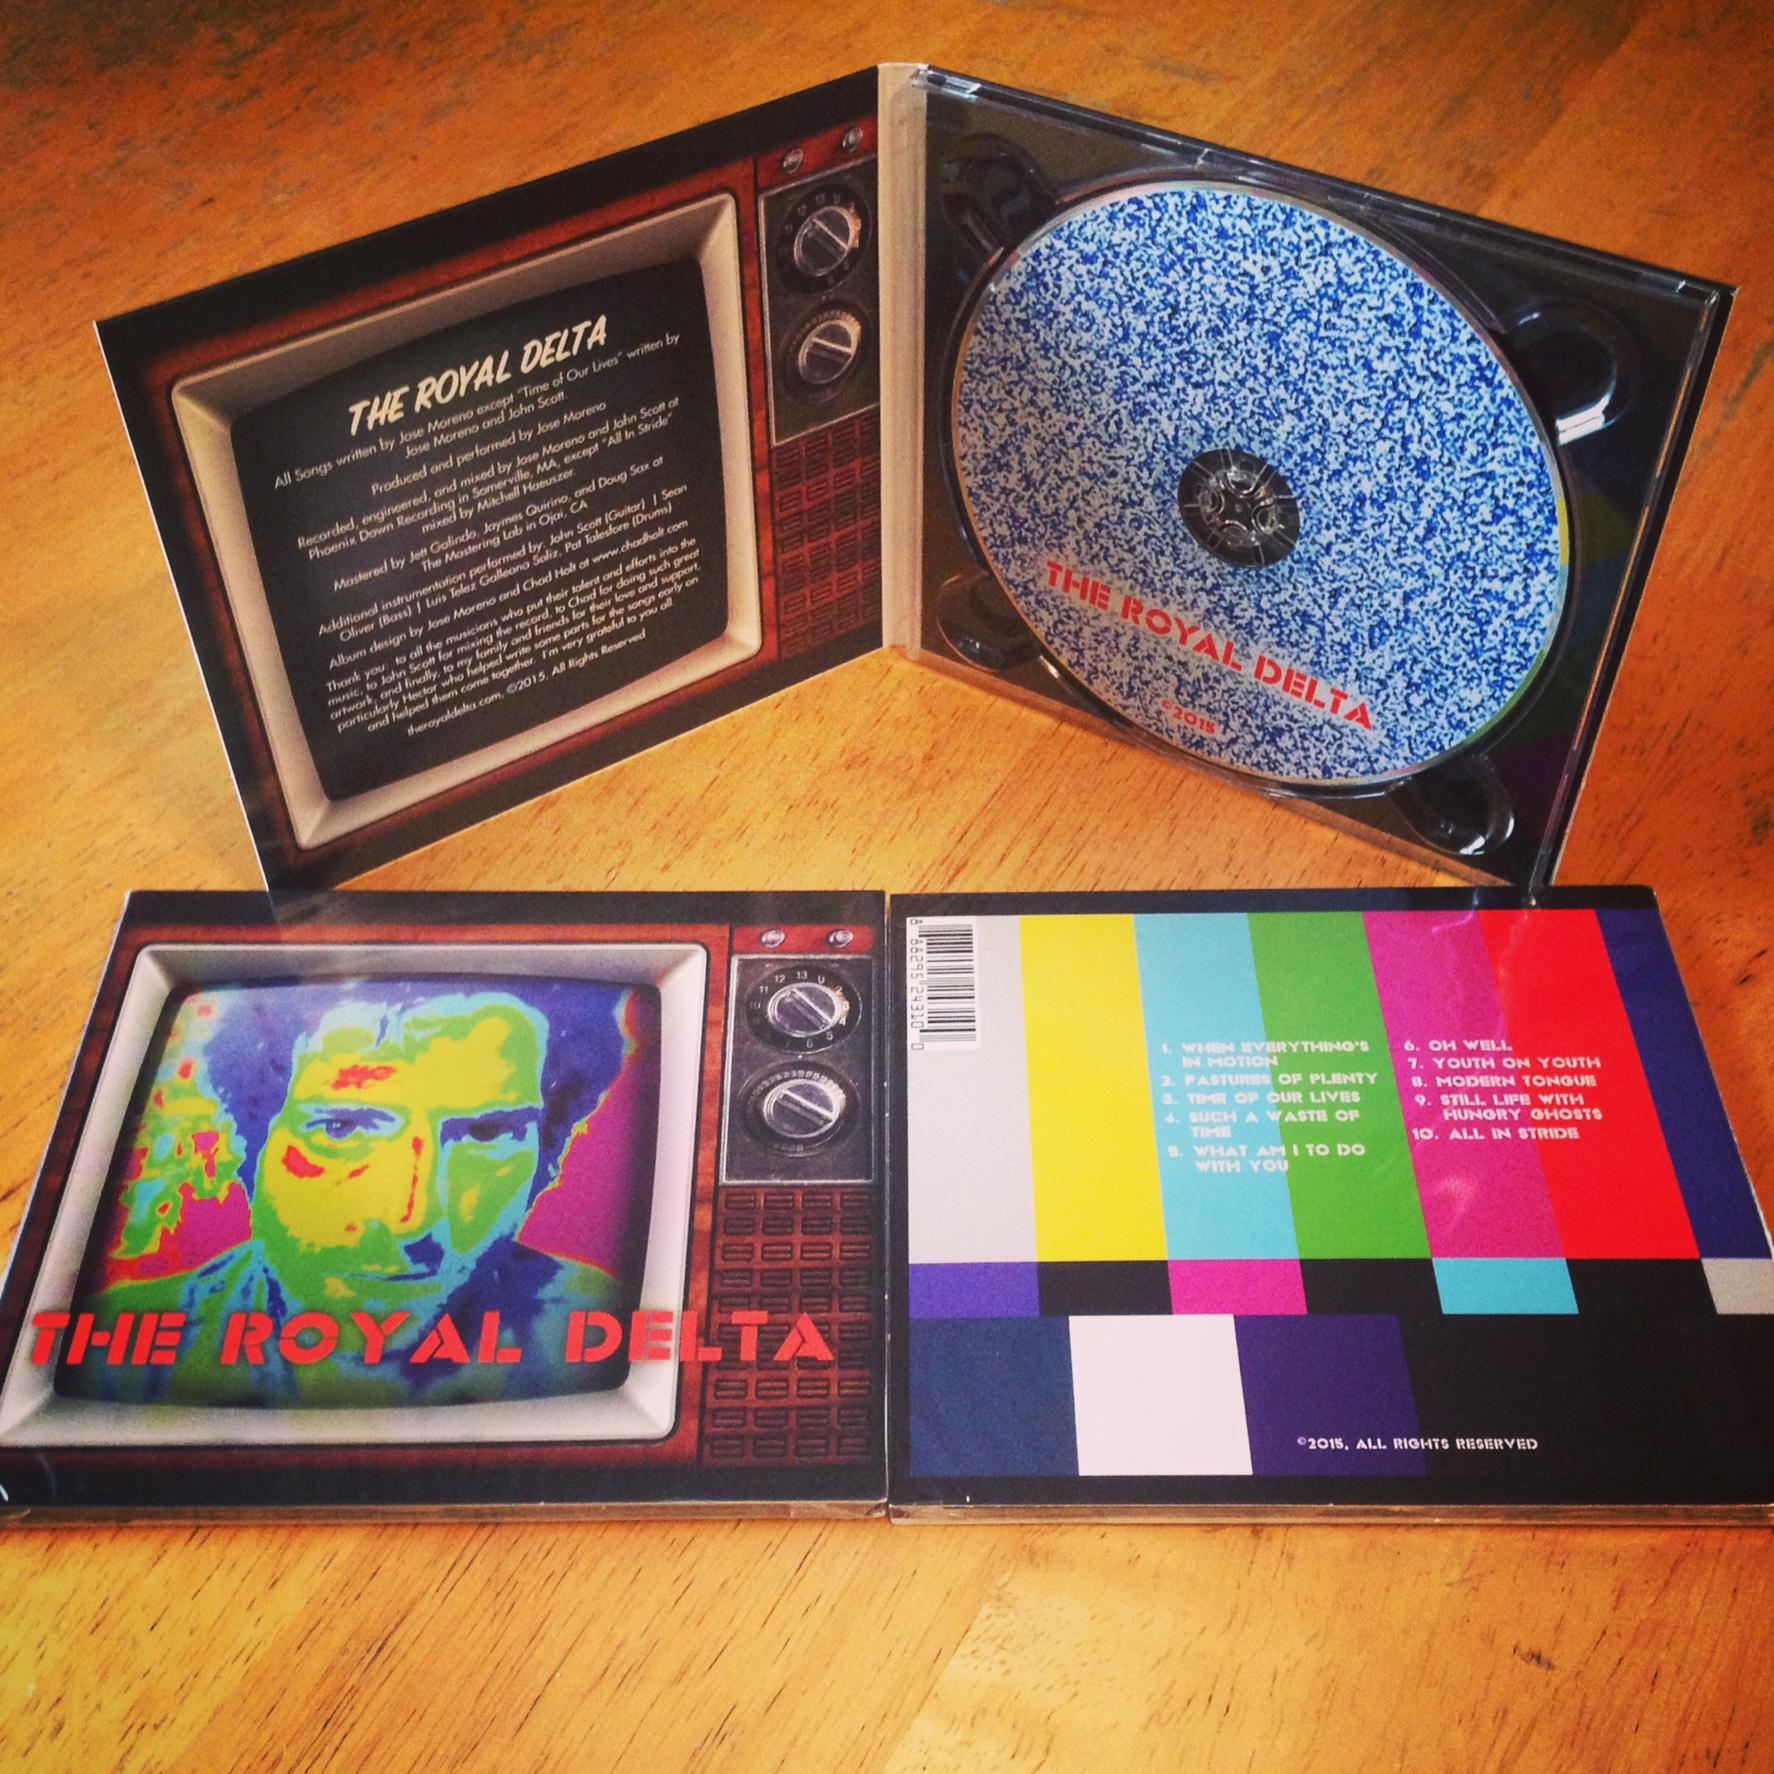 Royal Delta Debut CD Picture.JPG